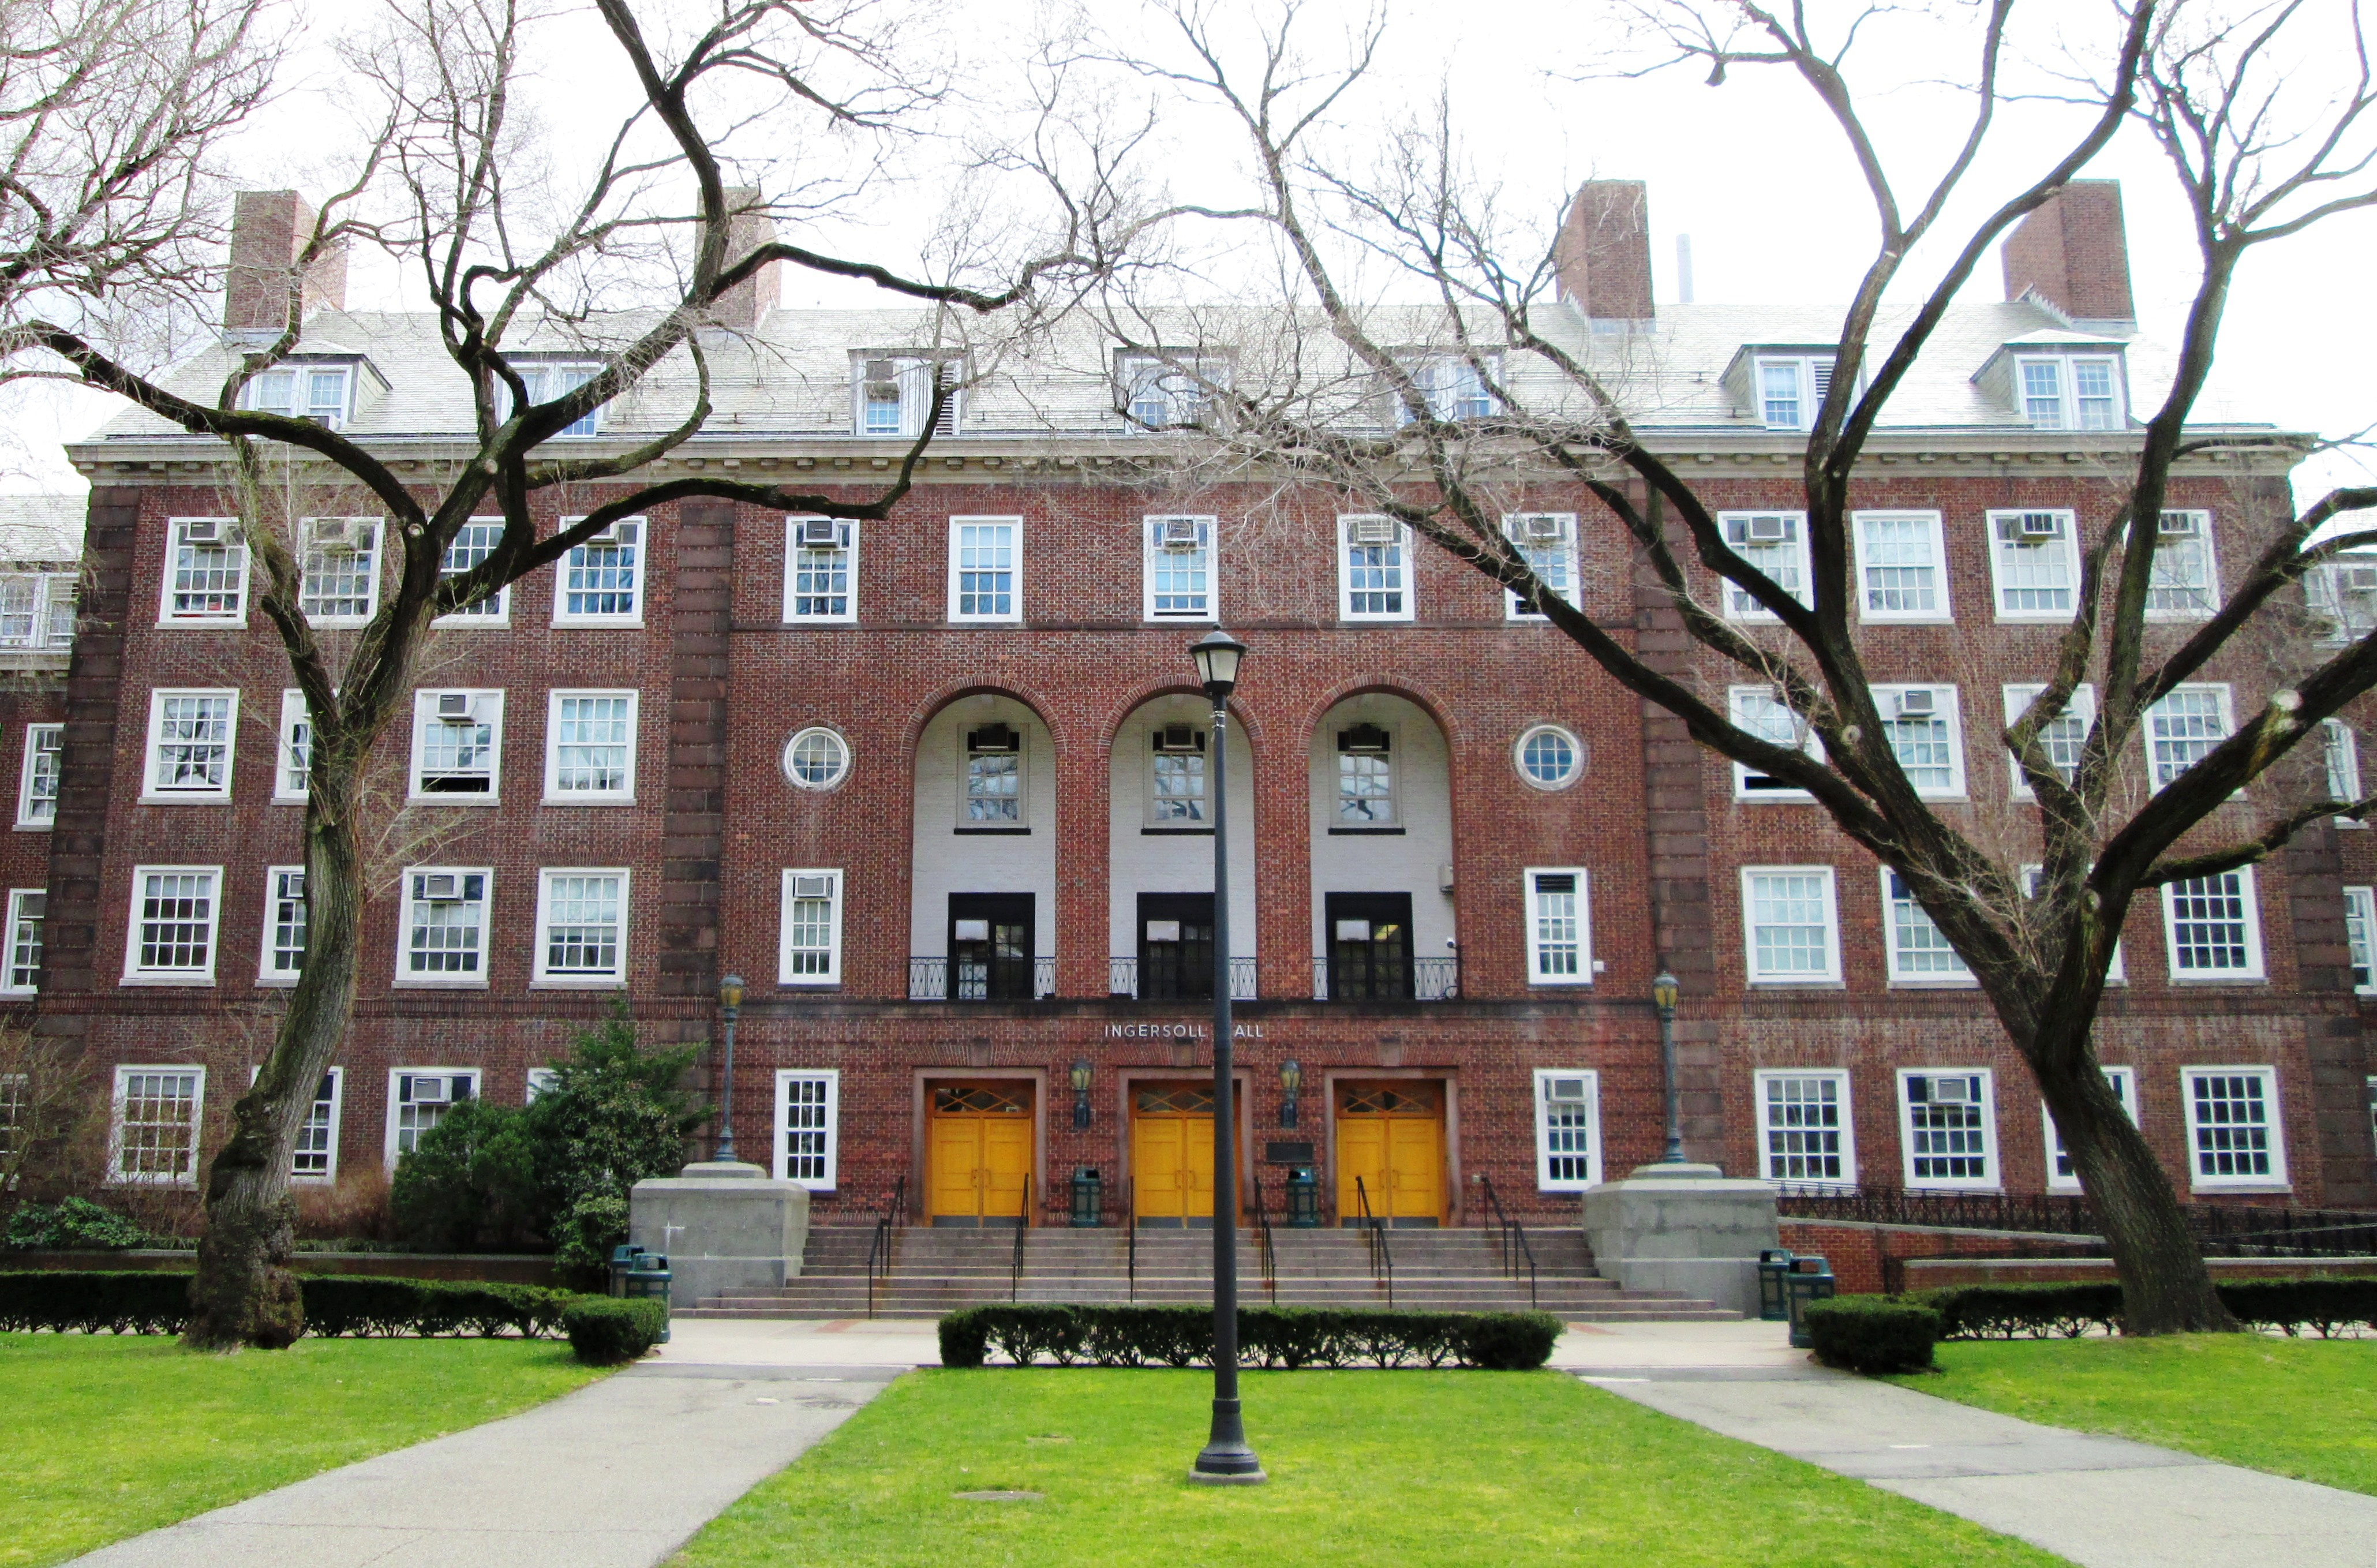 Brooklyn College - Ingersoll Hall